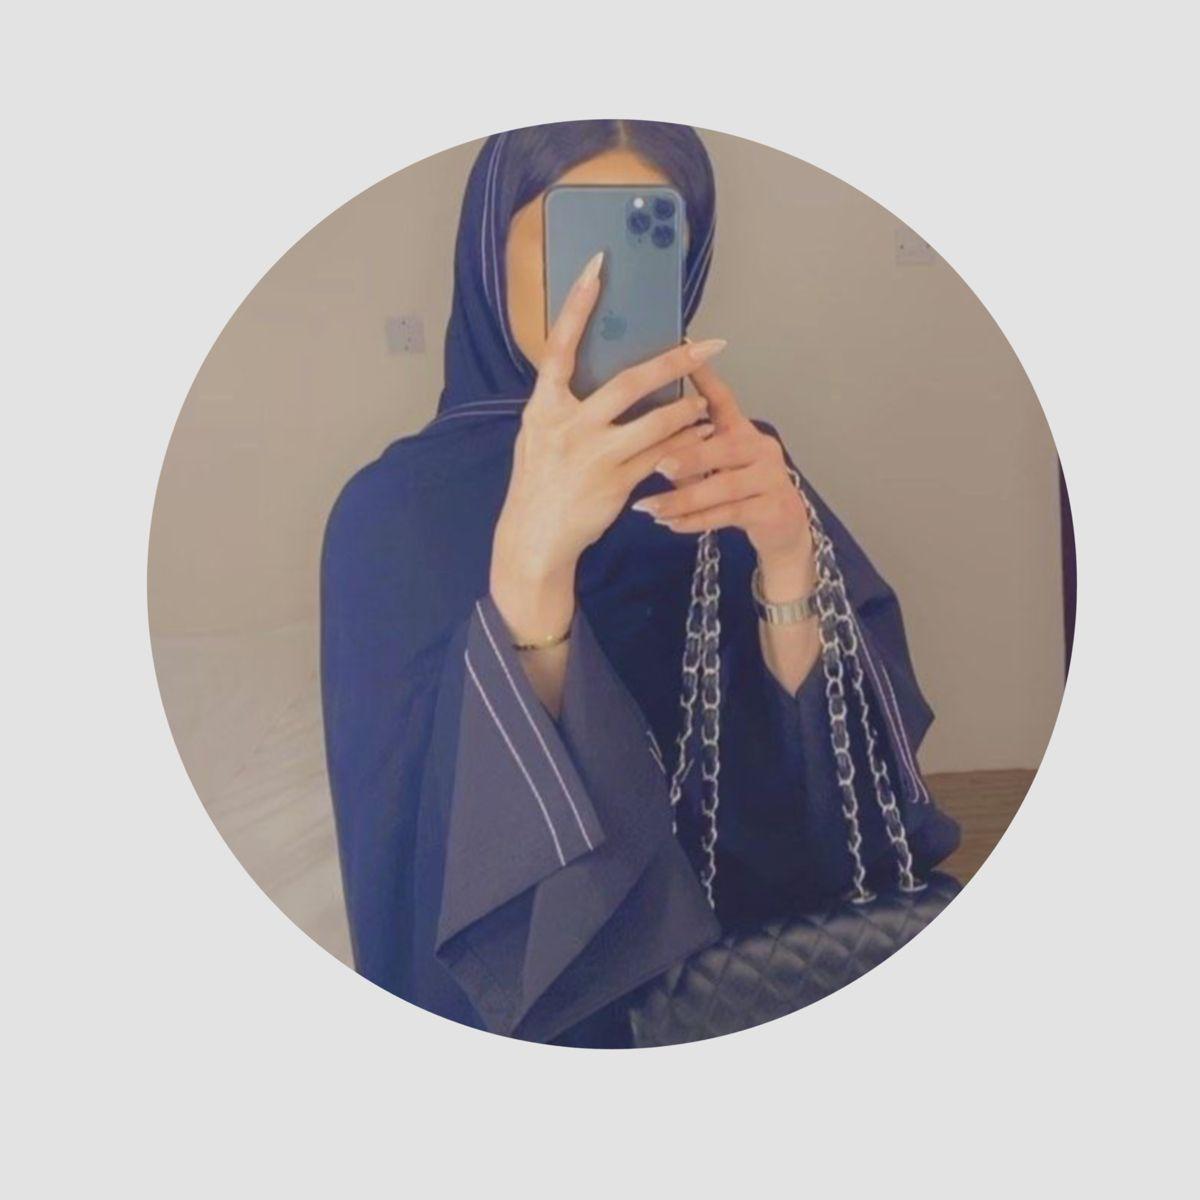 Pin By Zahra Faisal On افتارات بنات Pretty Girls Selfies Girly Photography Cute Girl Face